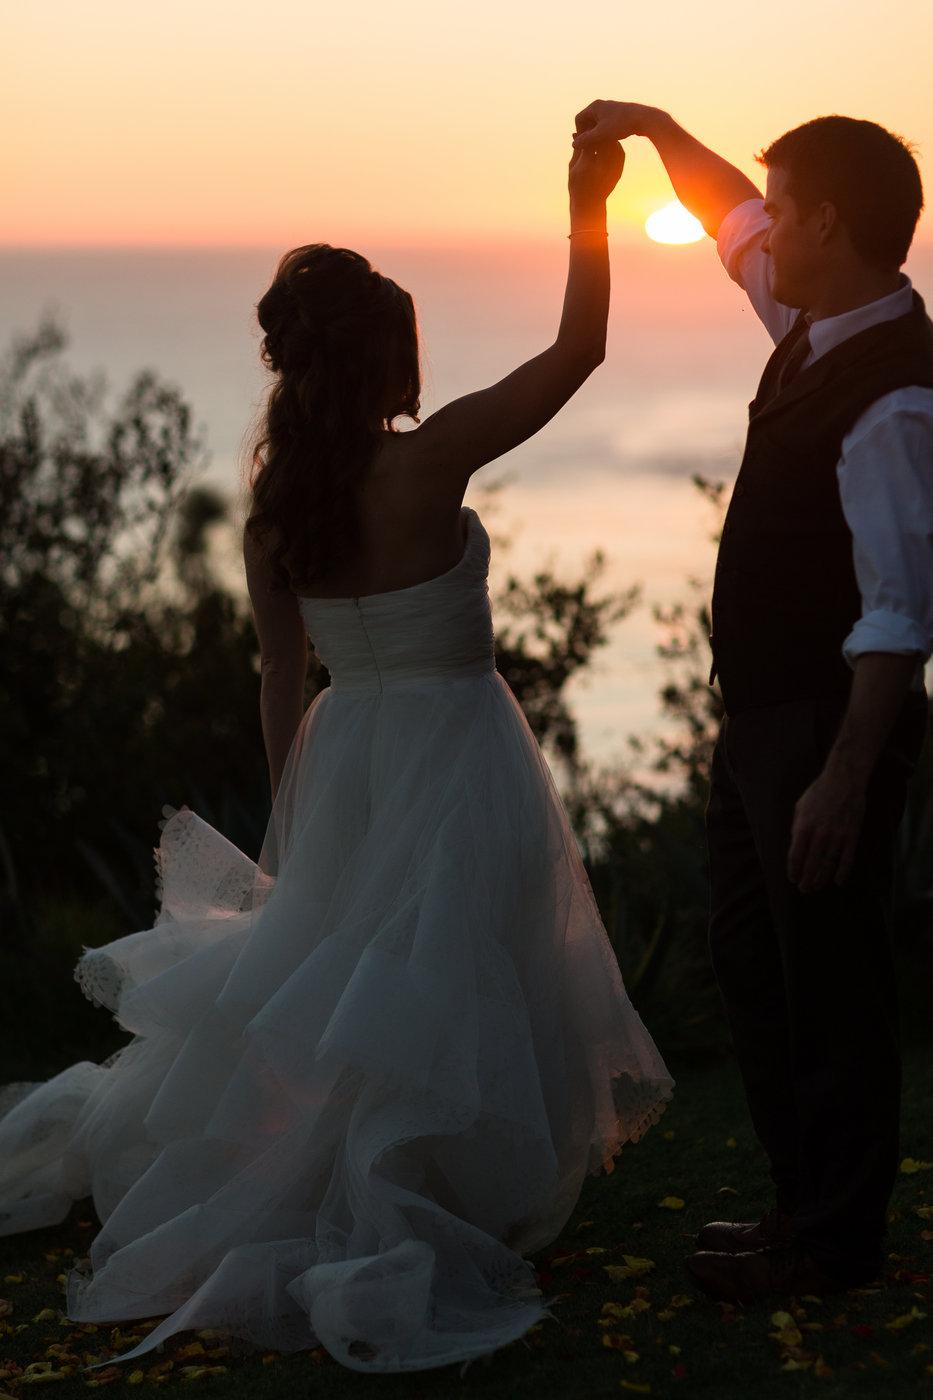 point-16-big-sur-california-sunset-wedding-photographer.jpg